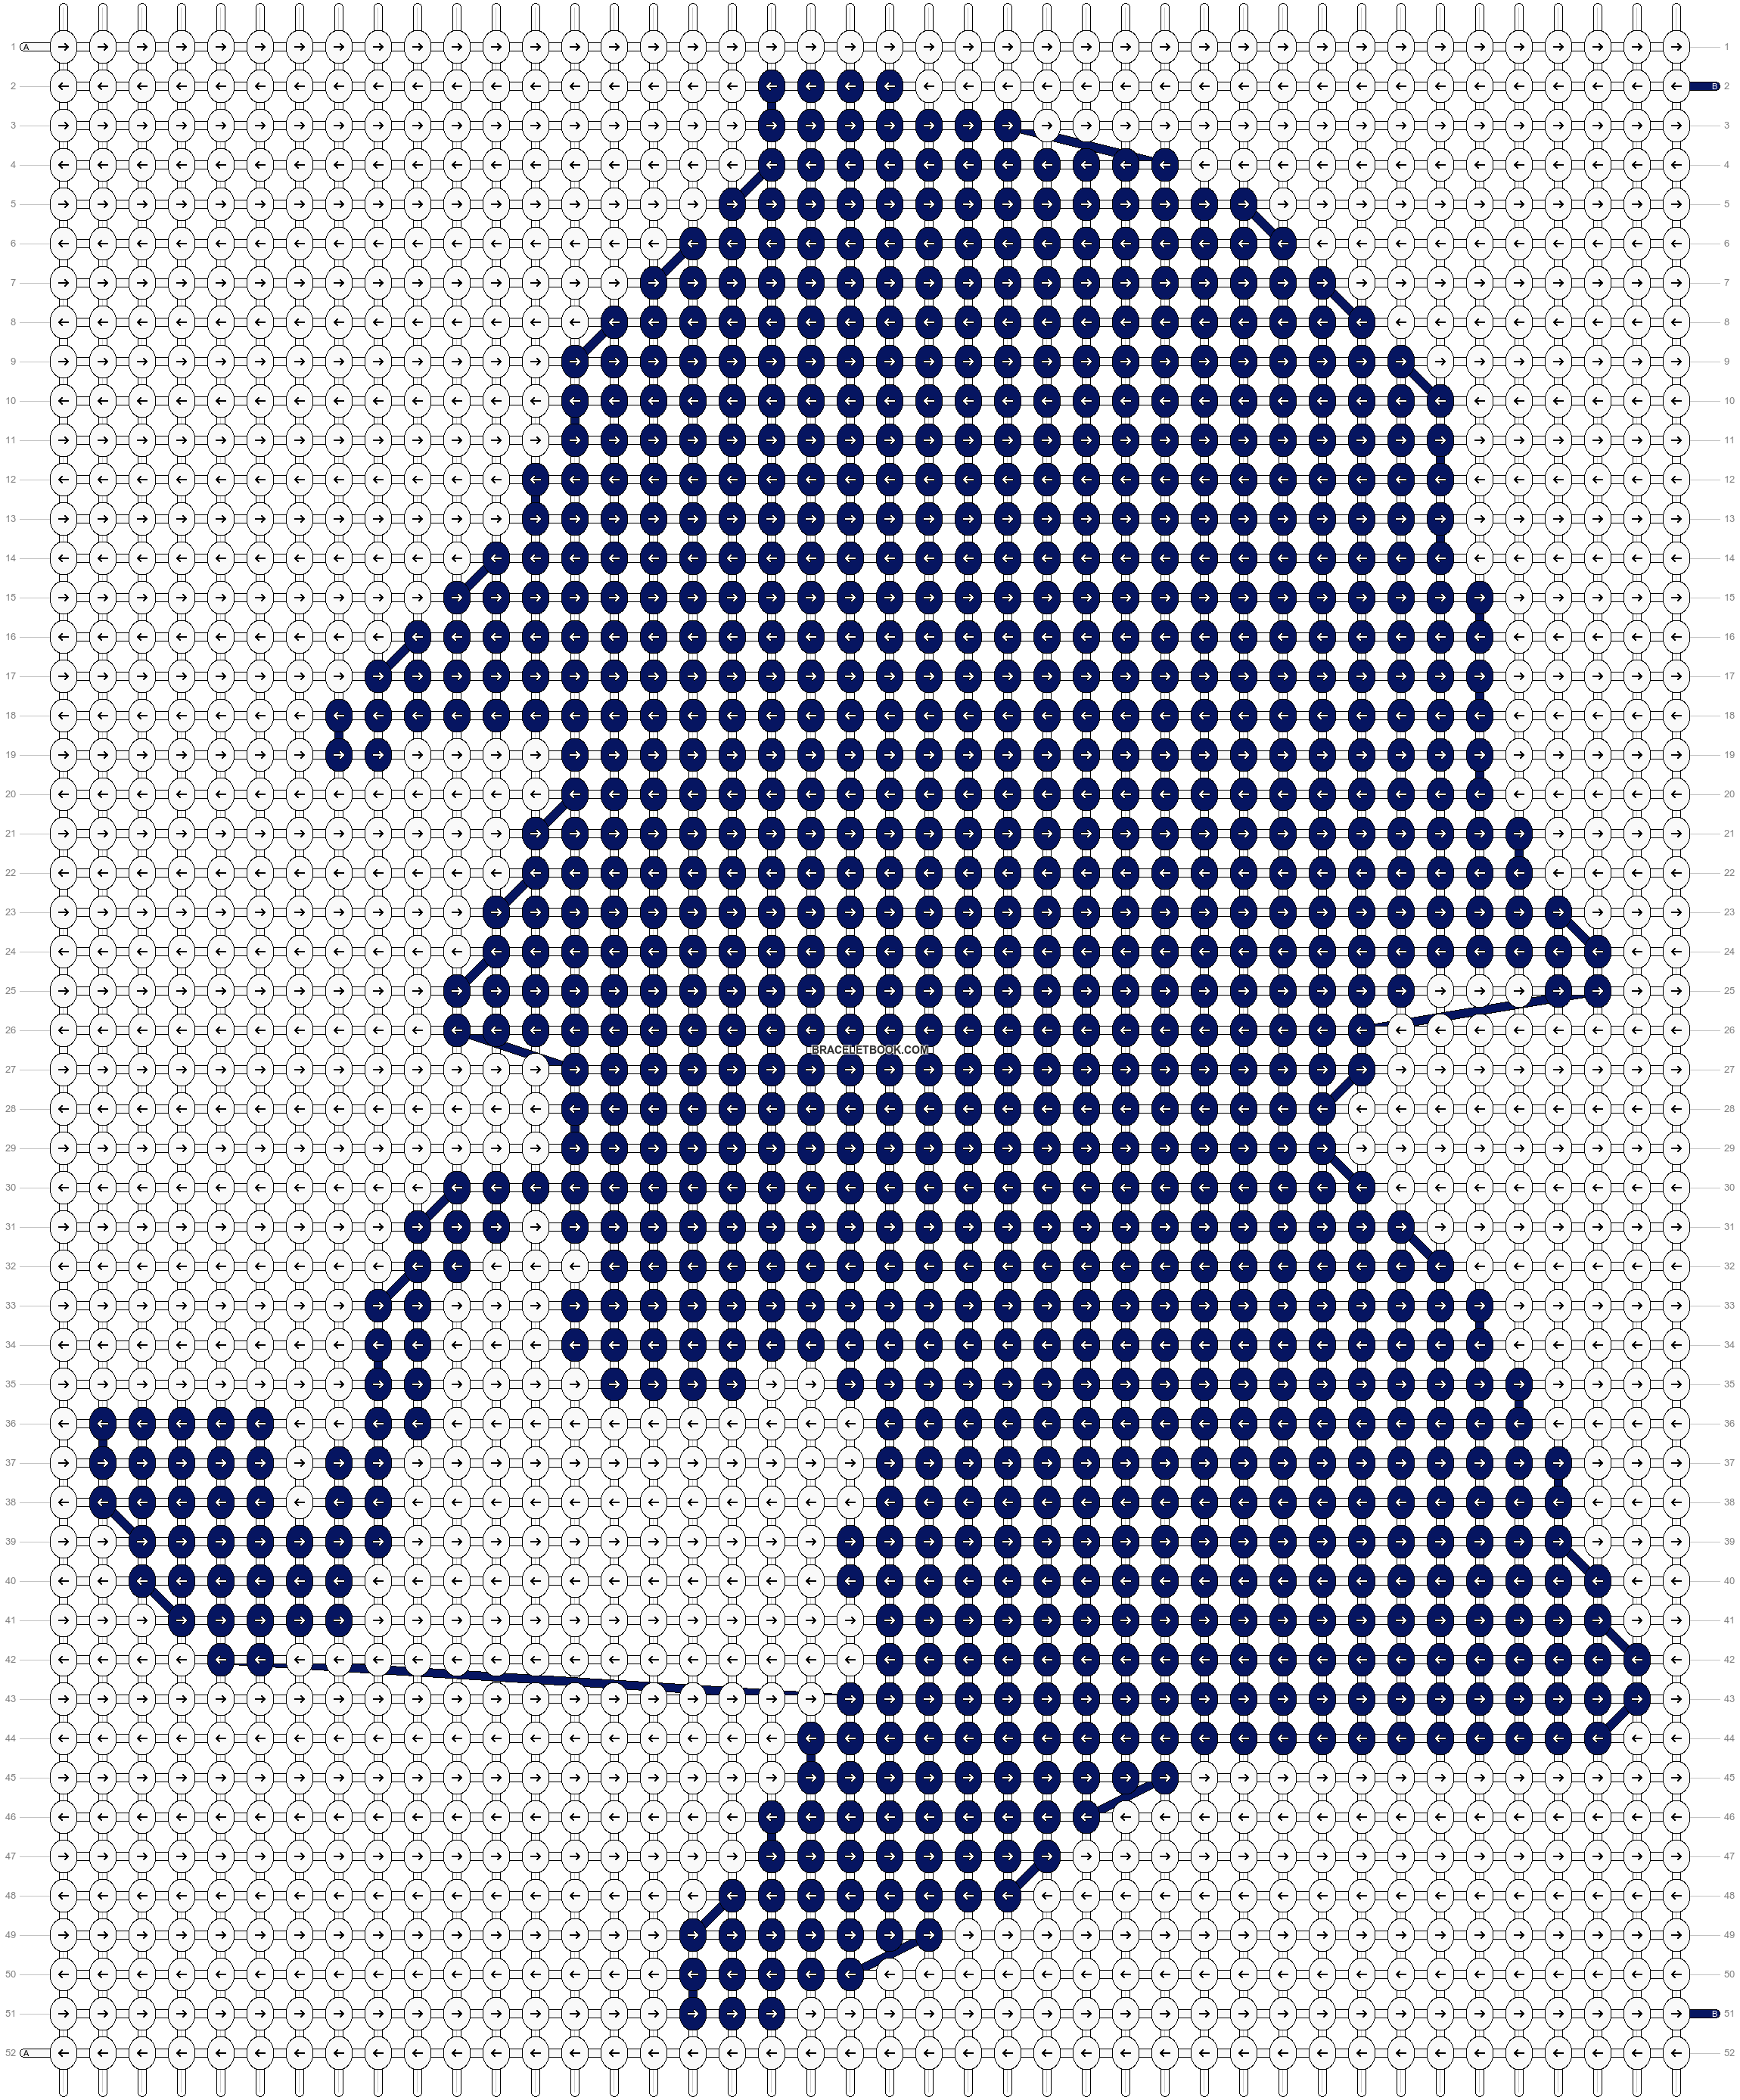 Alpha Pattern #22178 added by edeneph